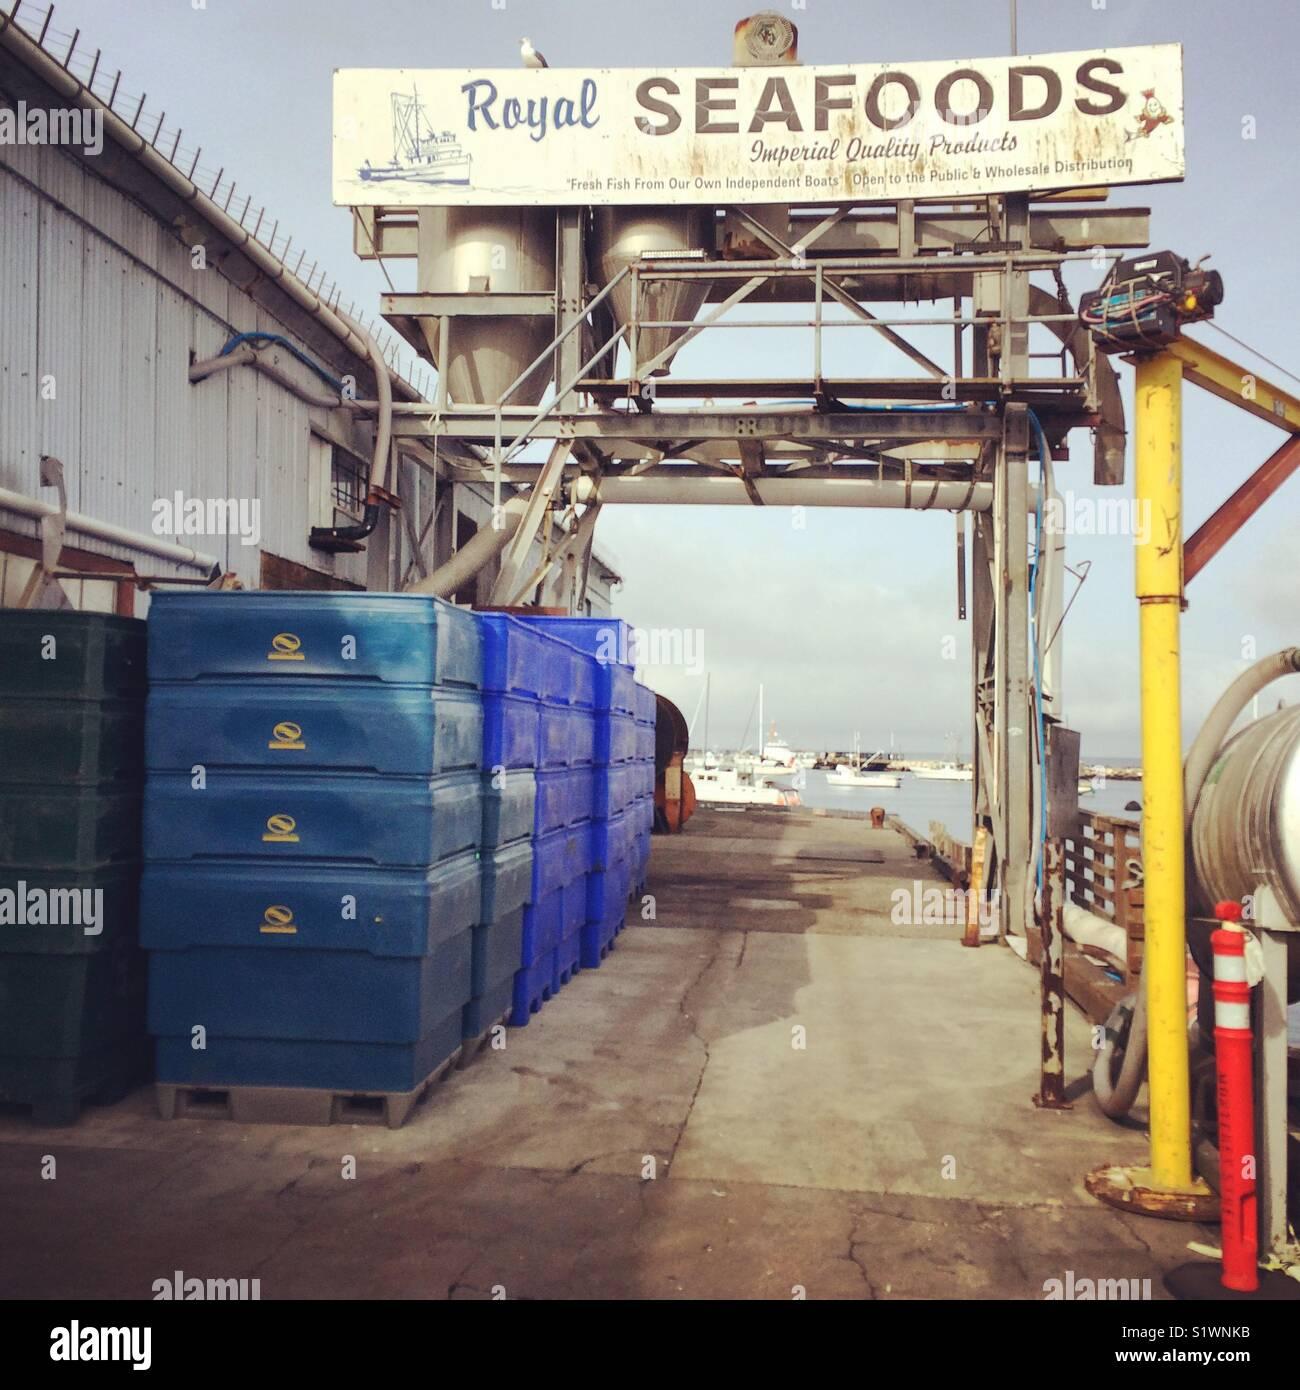 Royal Seafoods, Monterey Municipal Wharf 2, Monterey, Kalifornien Stockbild